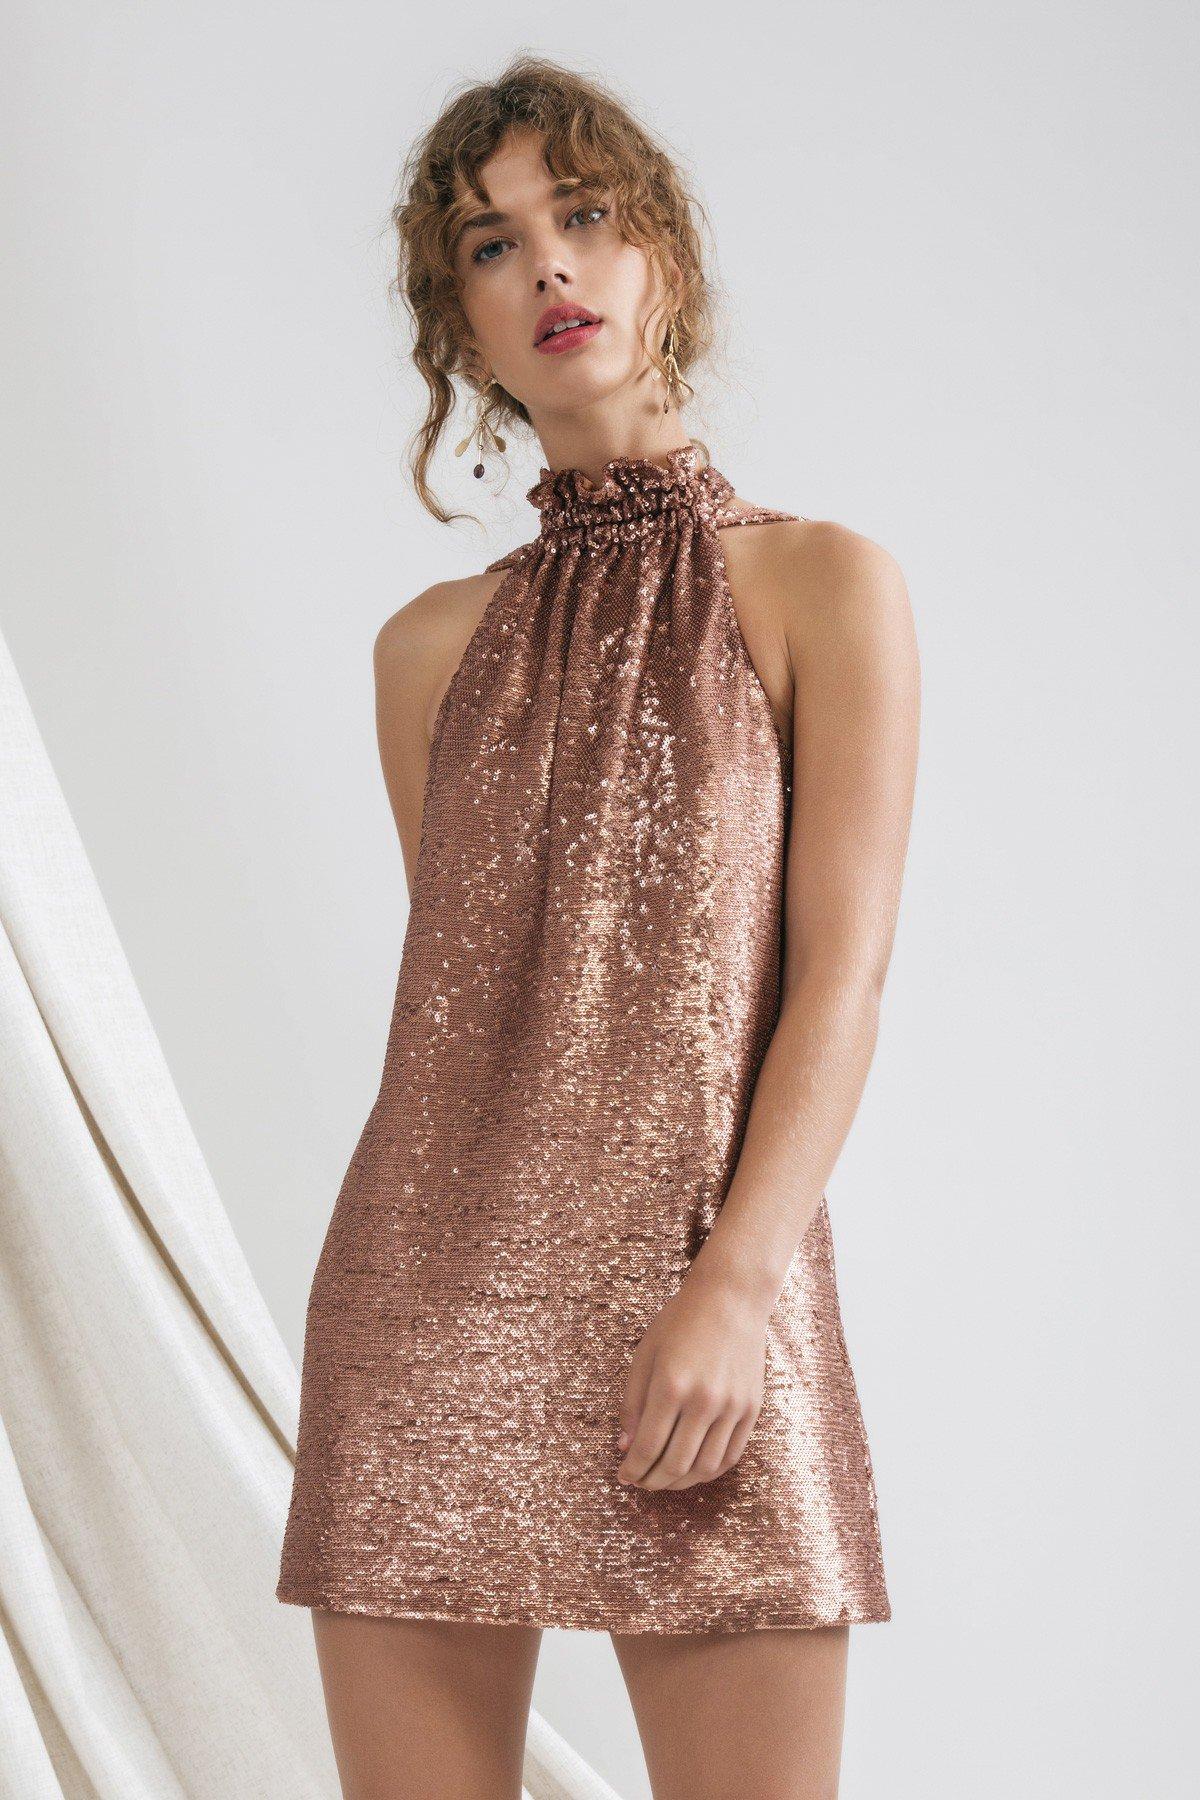 C/MEO Collective Illuminated Mini Dress